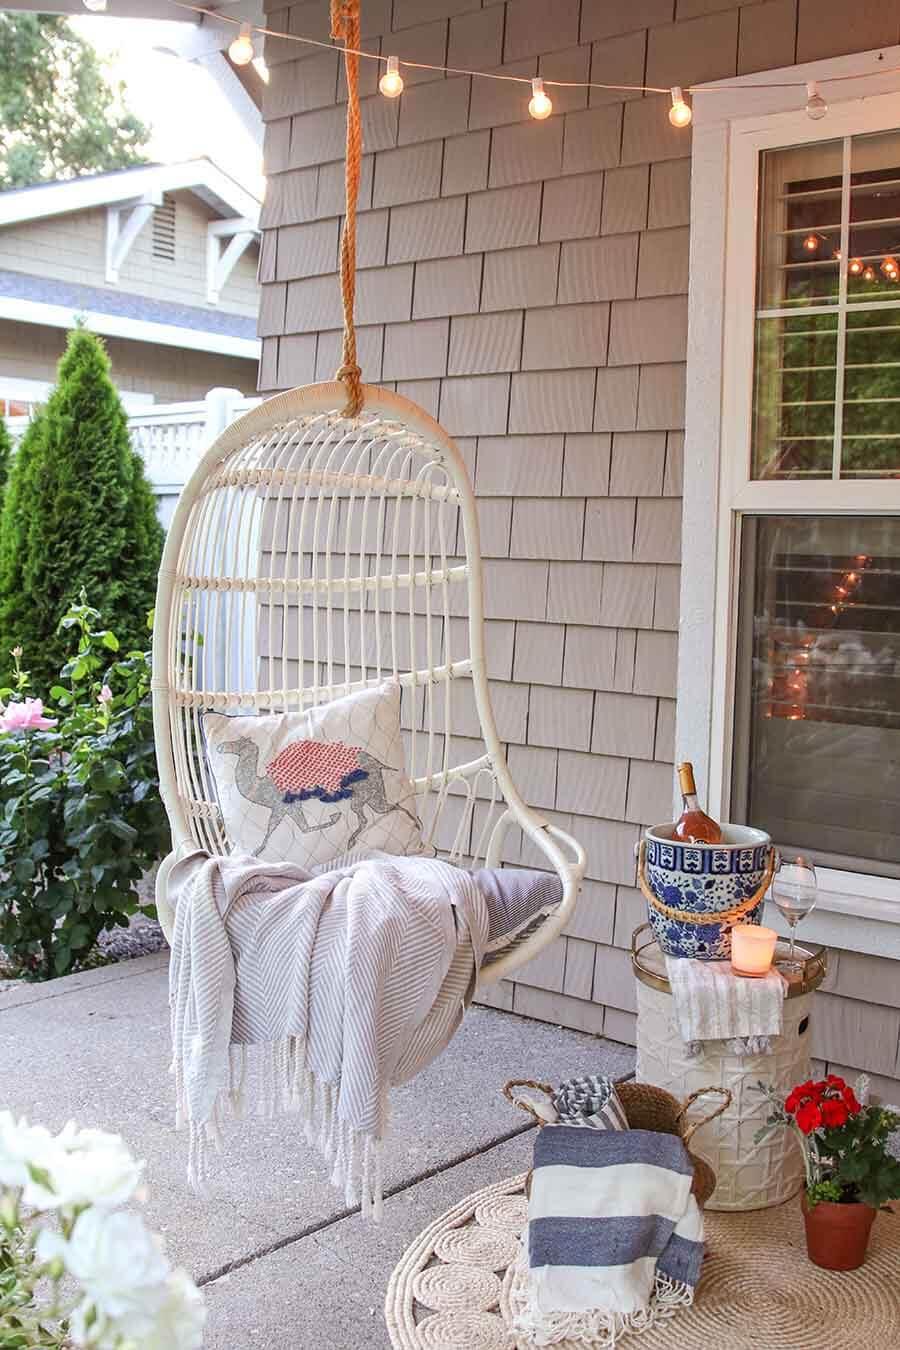 Soft Hanging Outdoor Hammock Chair